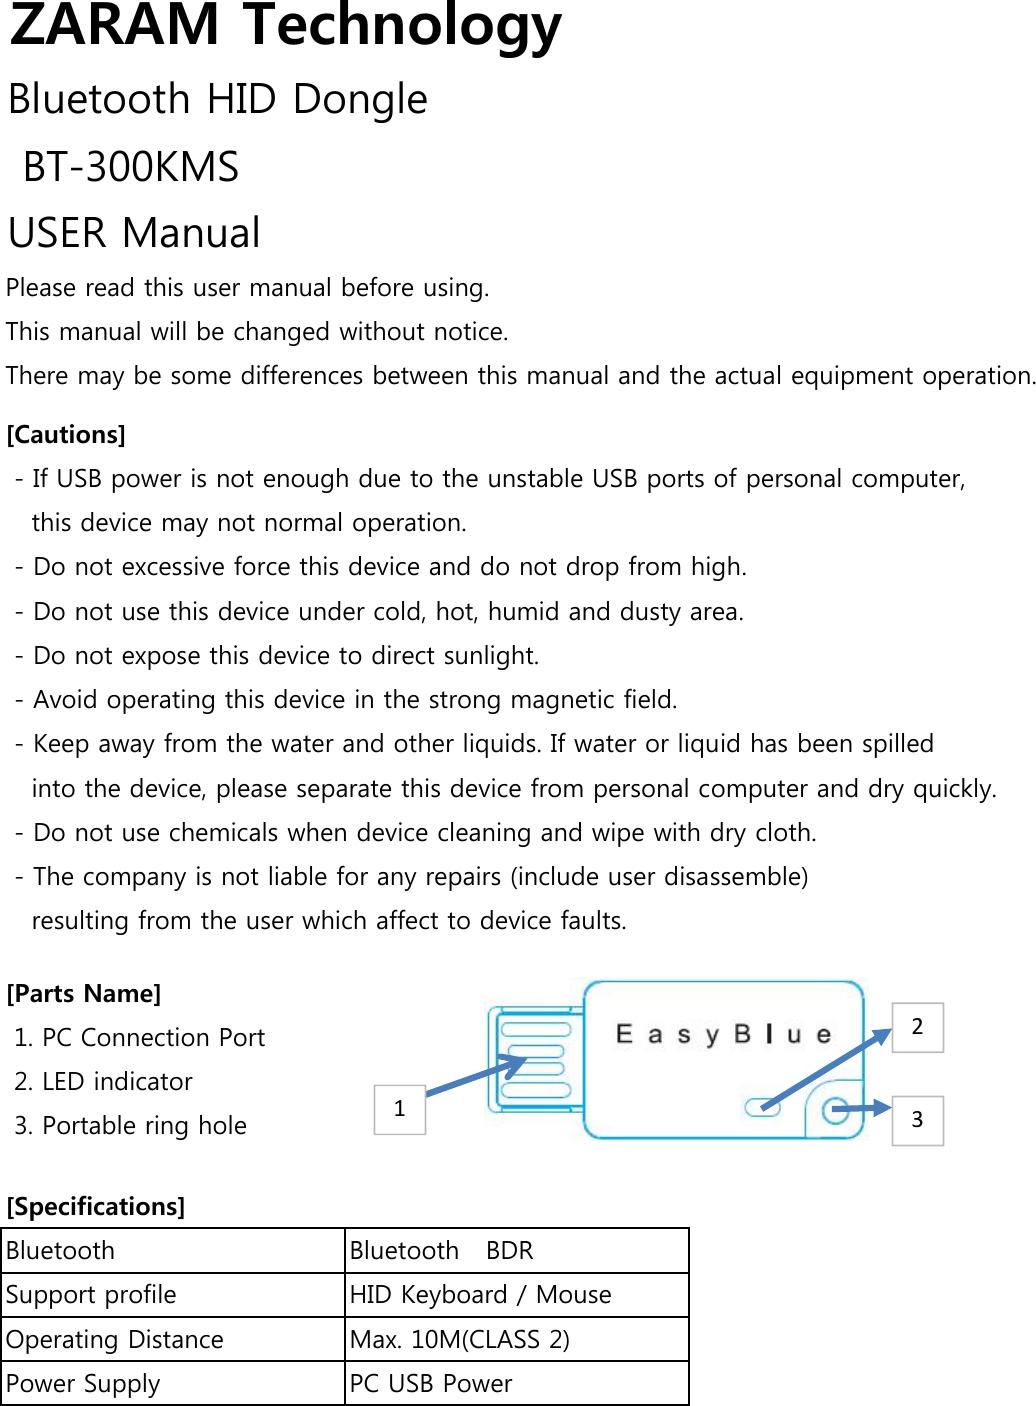 ZARAM TECHNOLOGY BT-300KMS Bluetooth HID Dongle User Manual